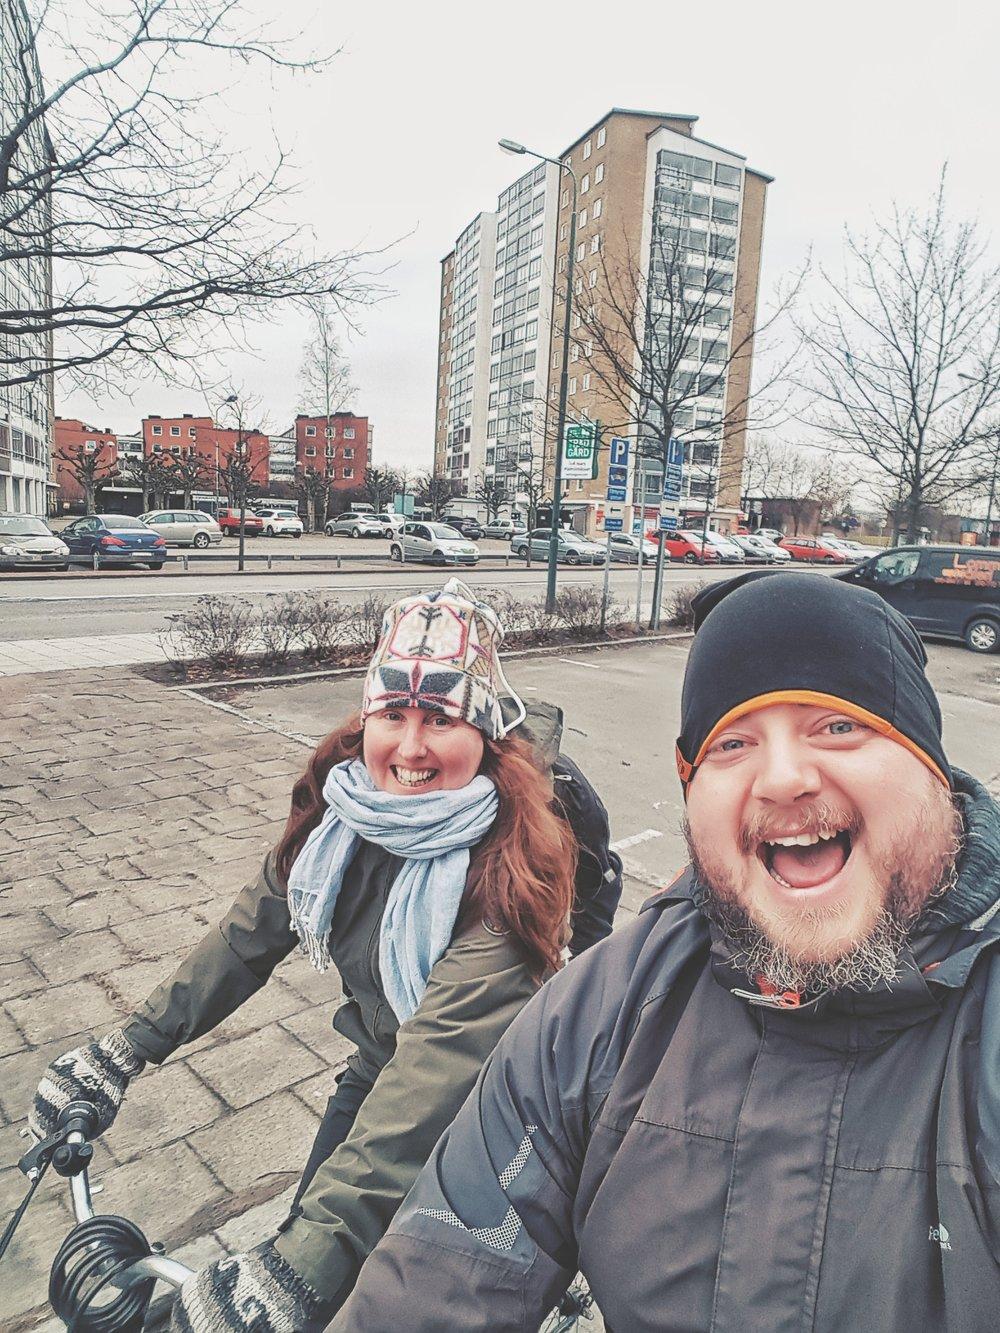 malmo. sweden. travel. scandinavia. history. viking. city. old. travel blog. bike selfie.jpeg